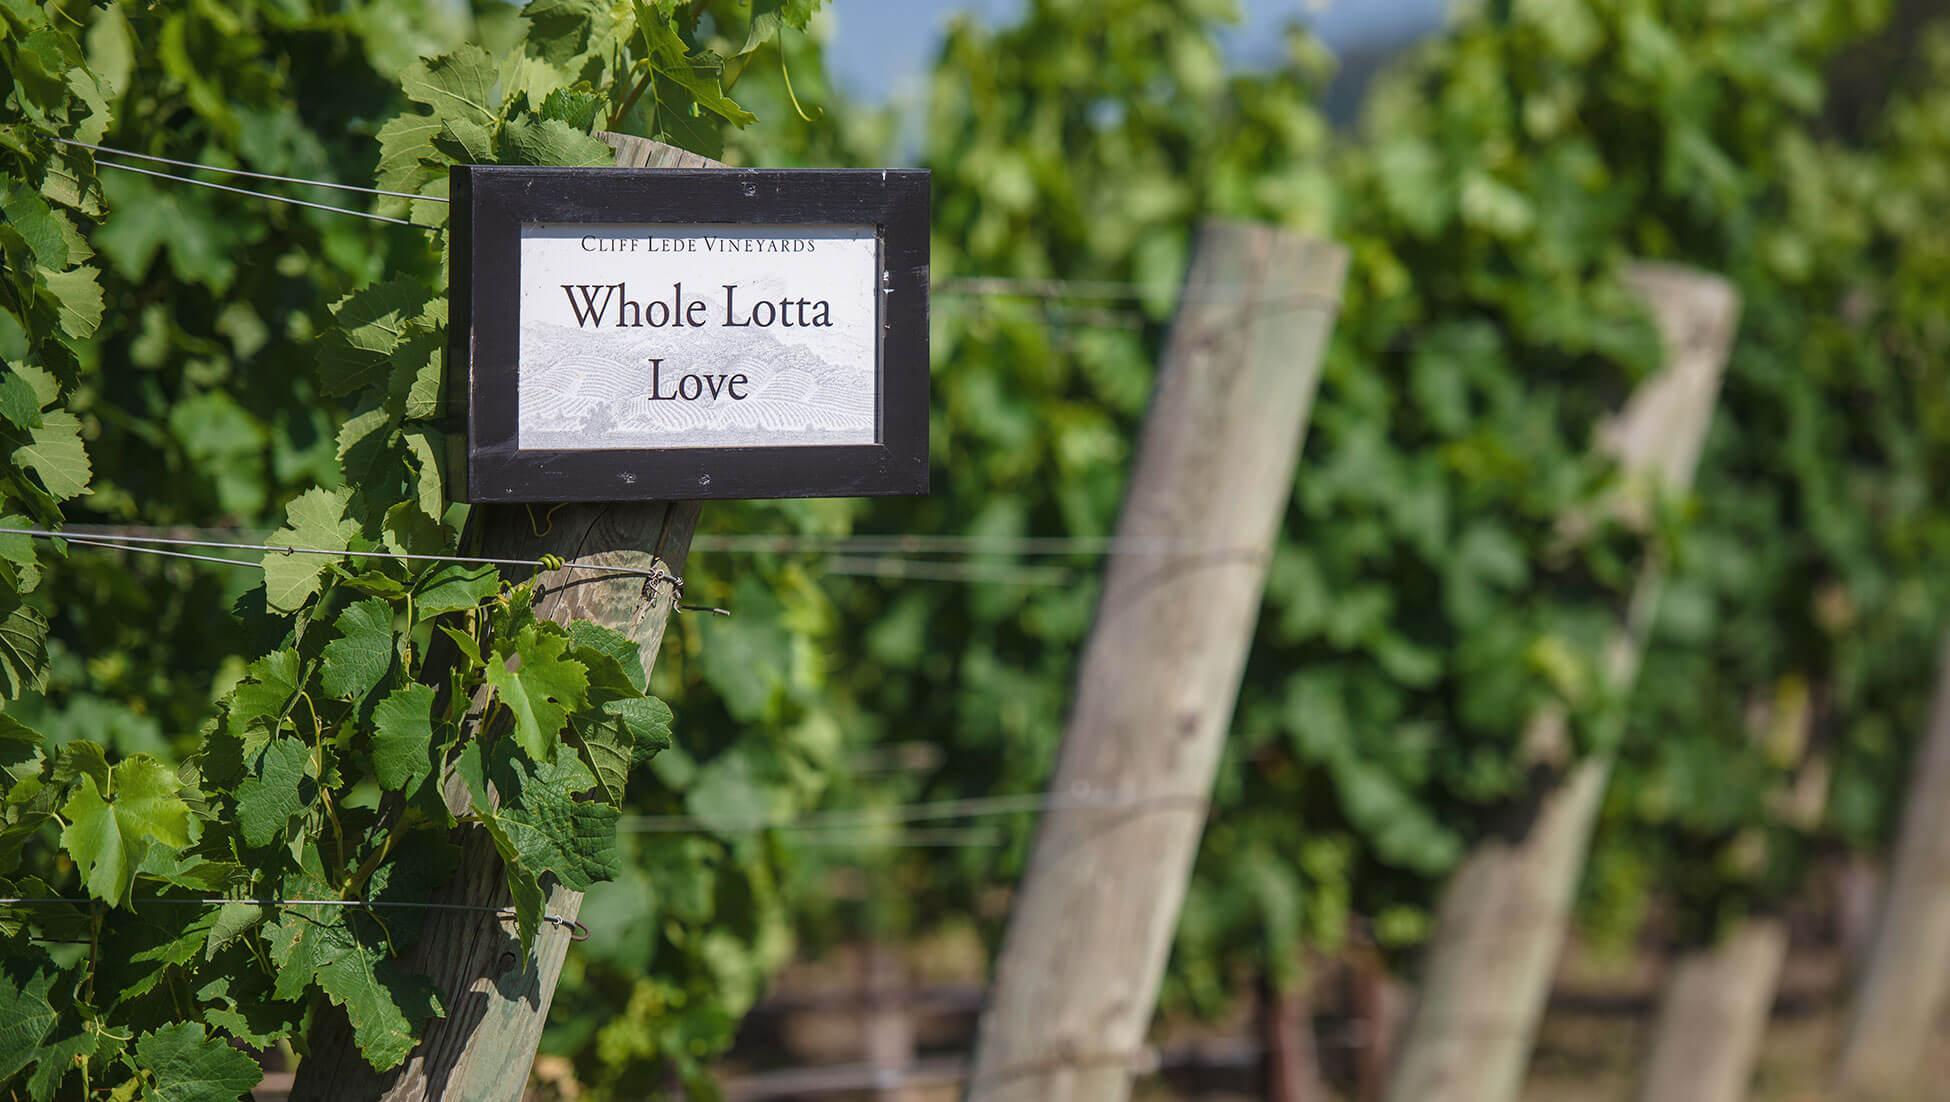 Whole Lotta Love vineyard sign